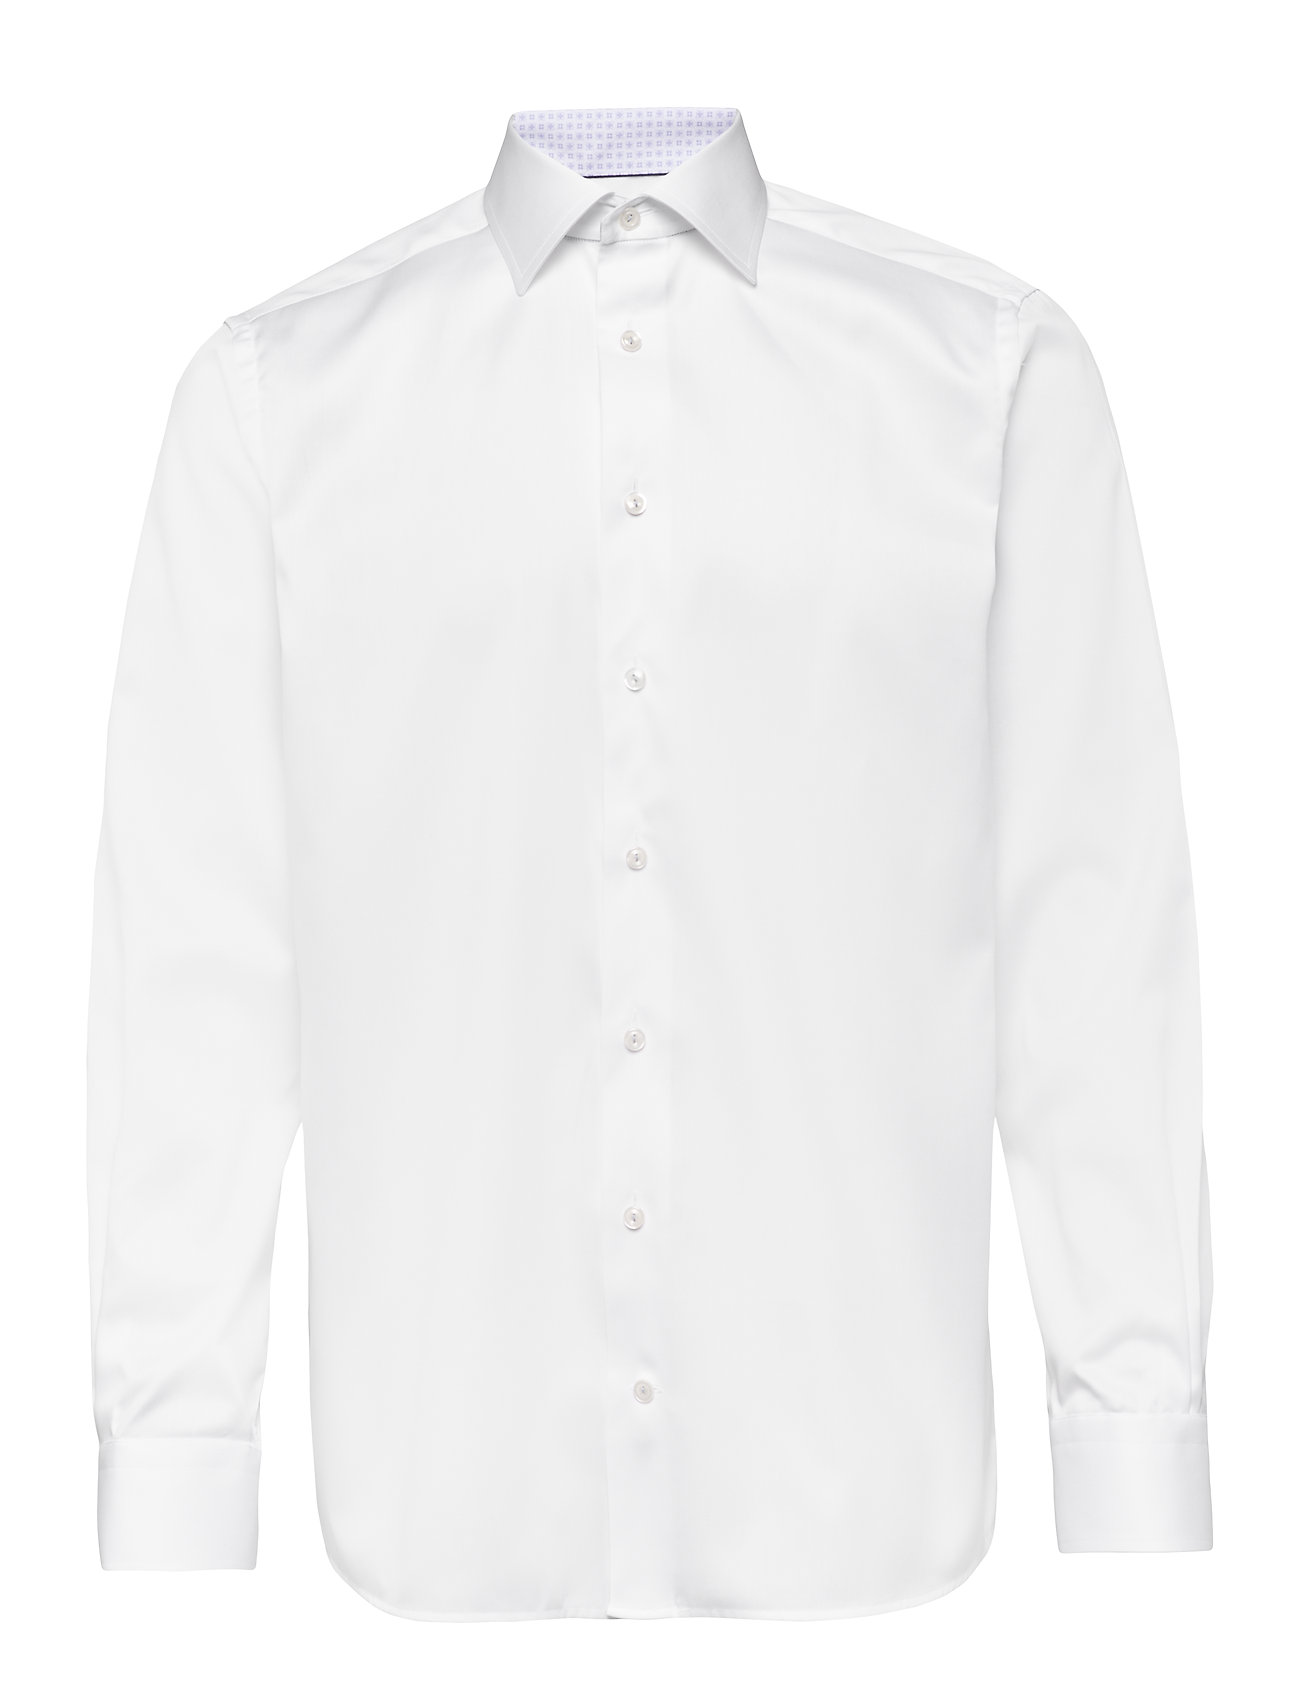 Eton Twill Shirt – Paisley Details - WHITE